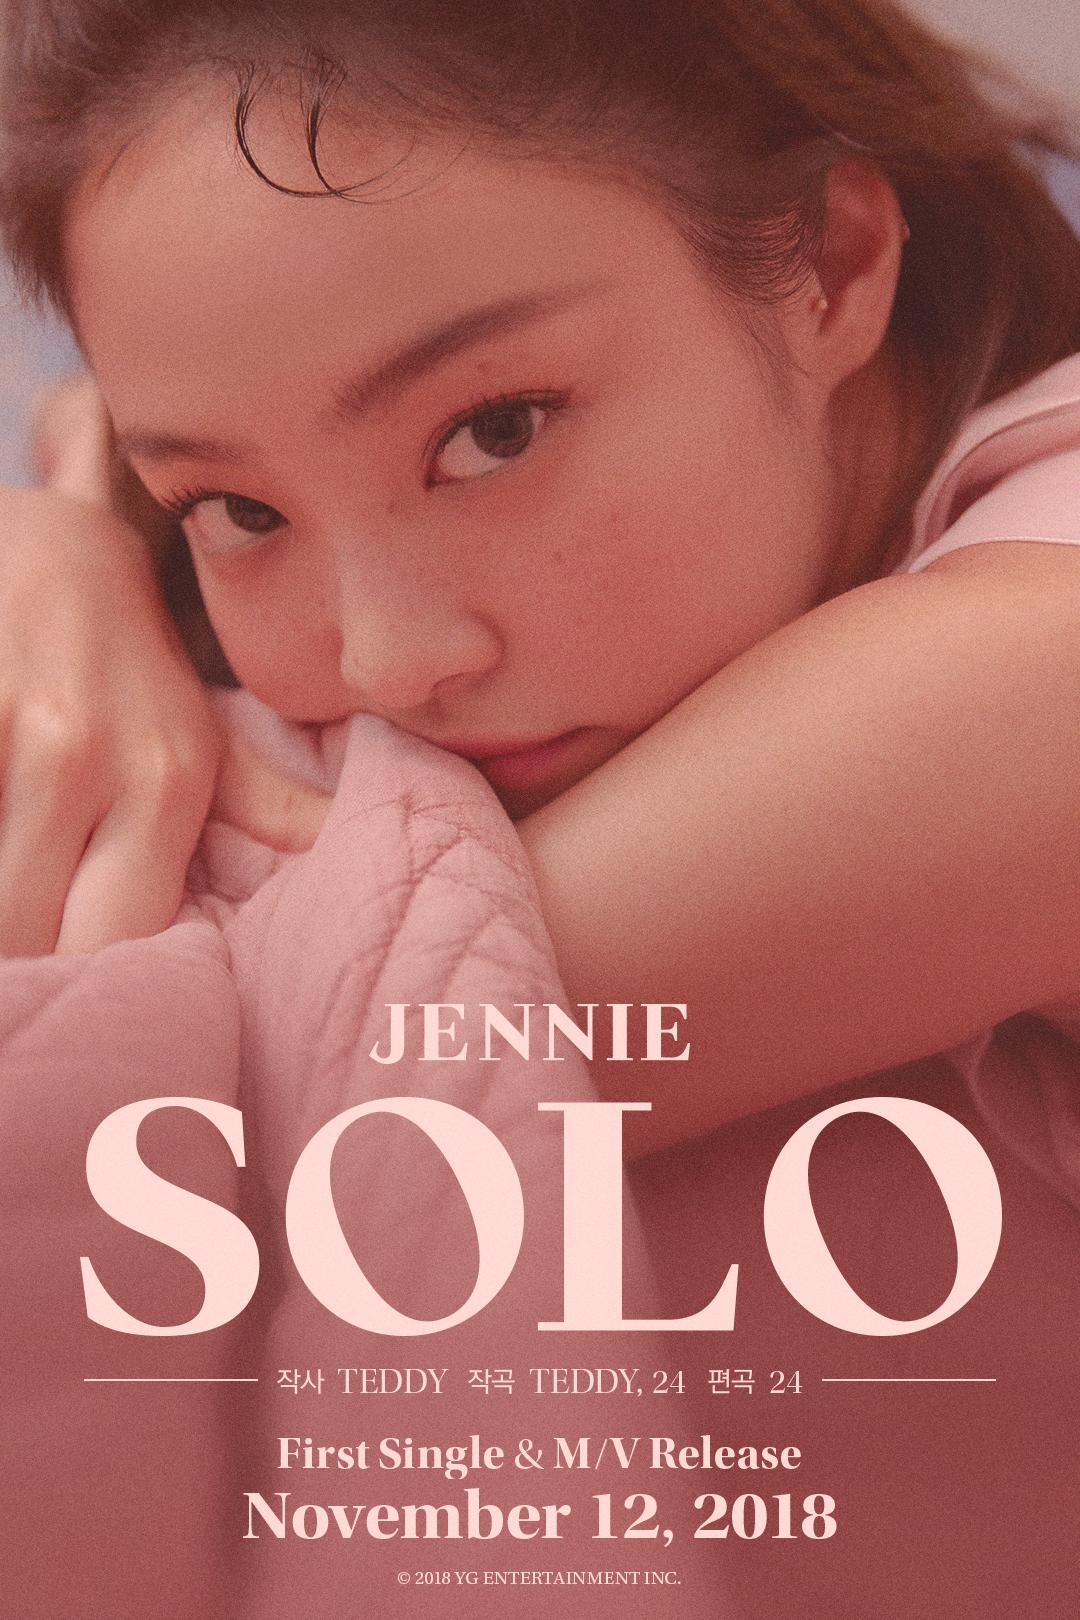 JENNIE_SOLO_TS2